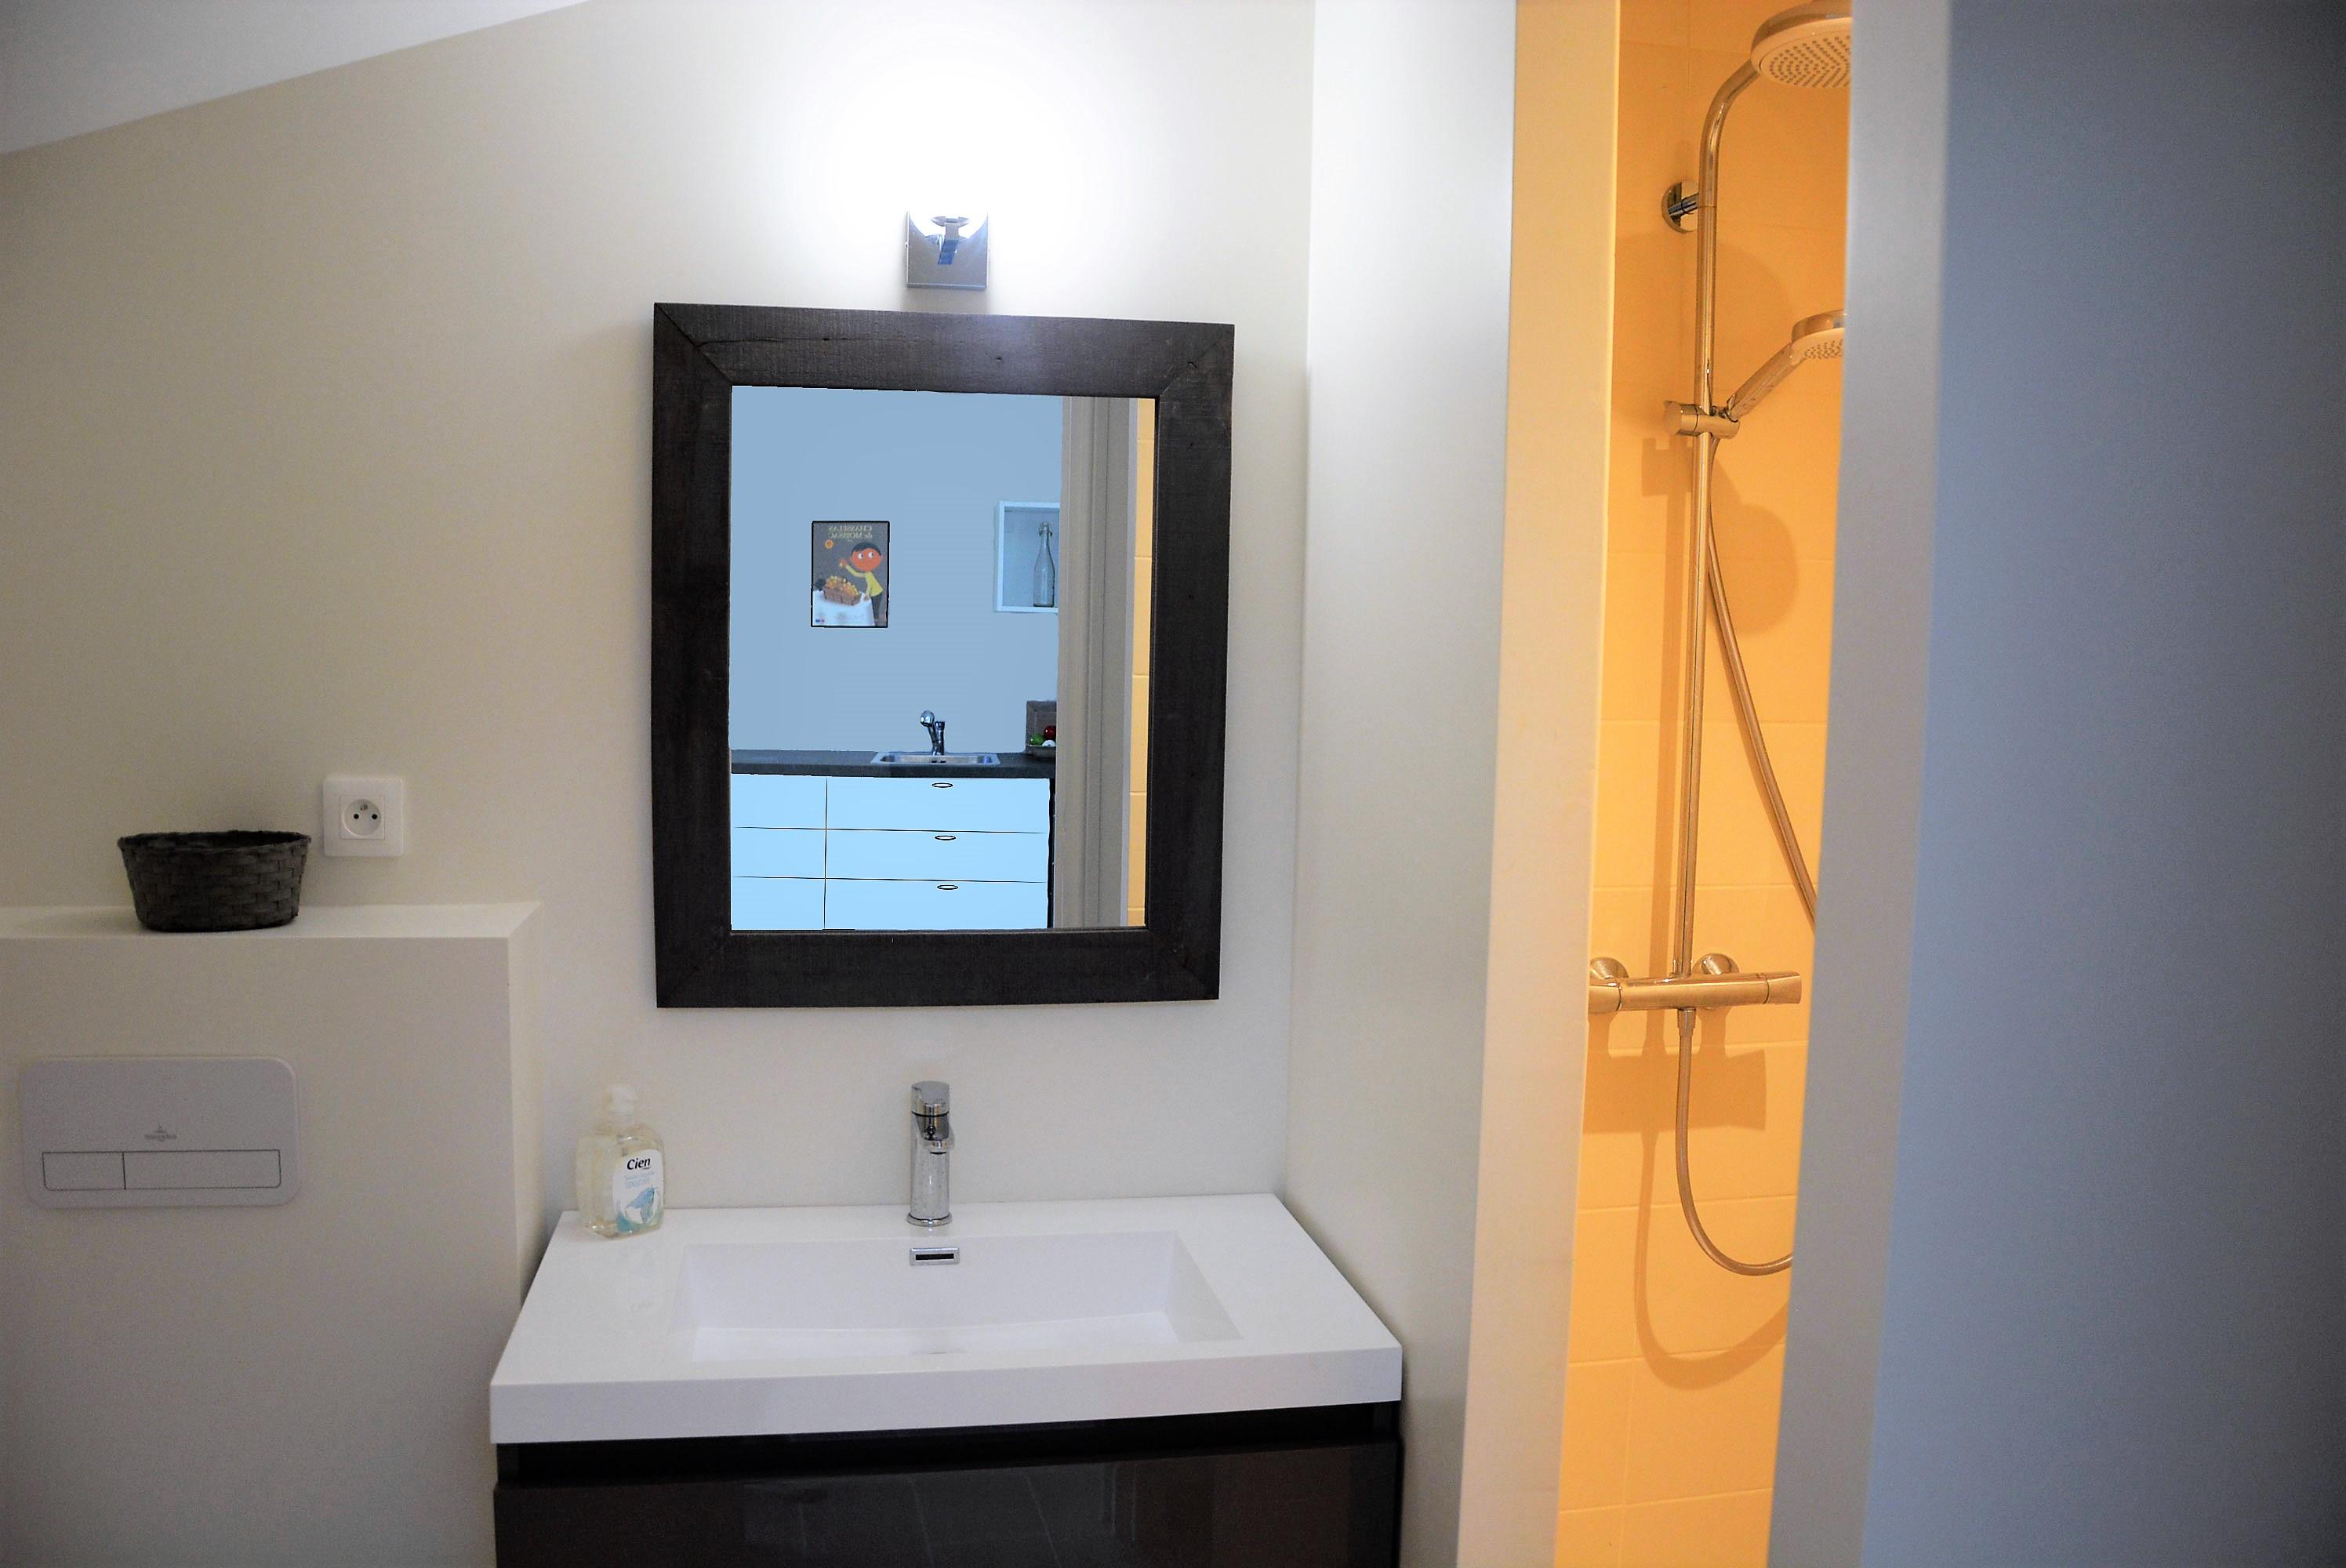 Salle De Bain Couloir Fenetre ~ guest apartments and bed breakfast ch teau lavalade